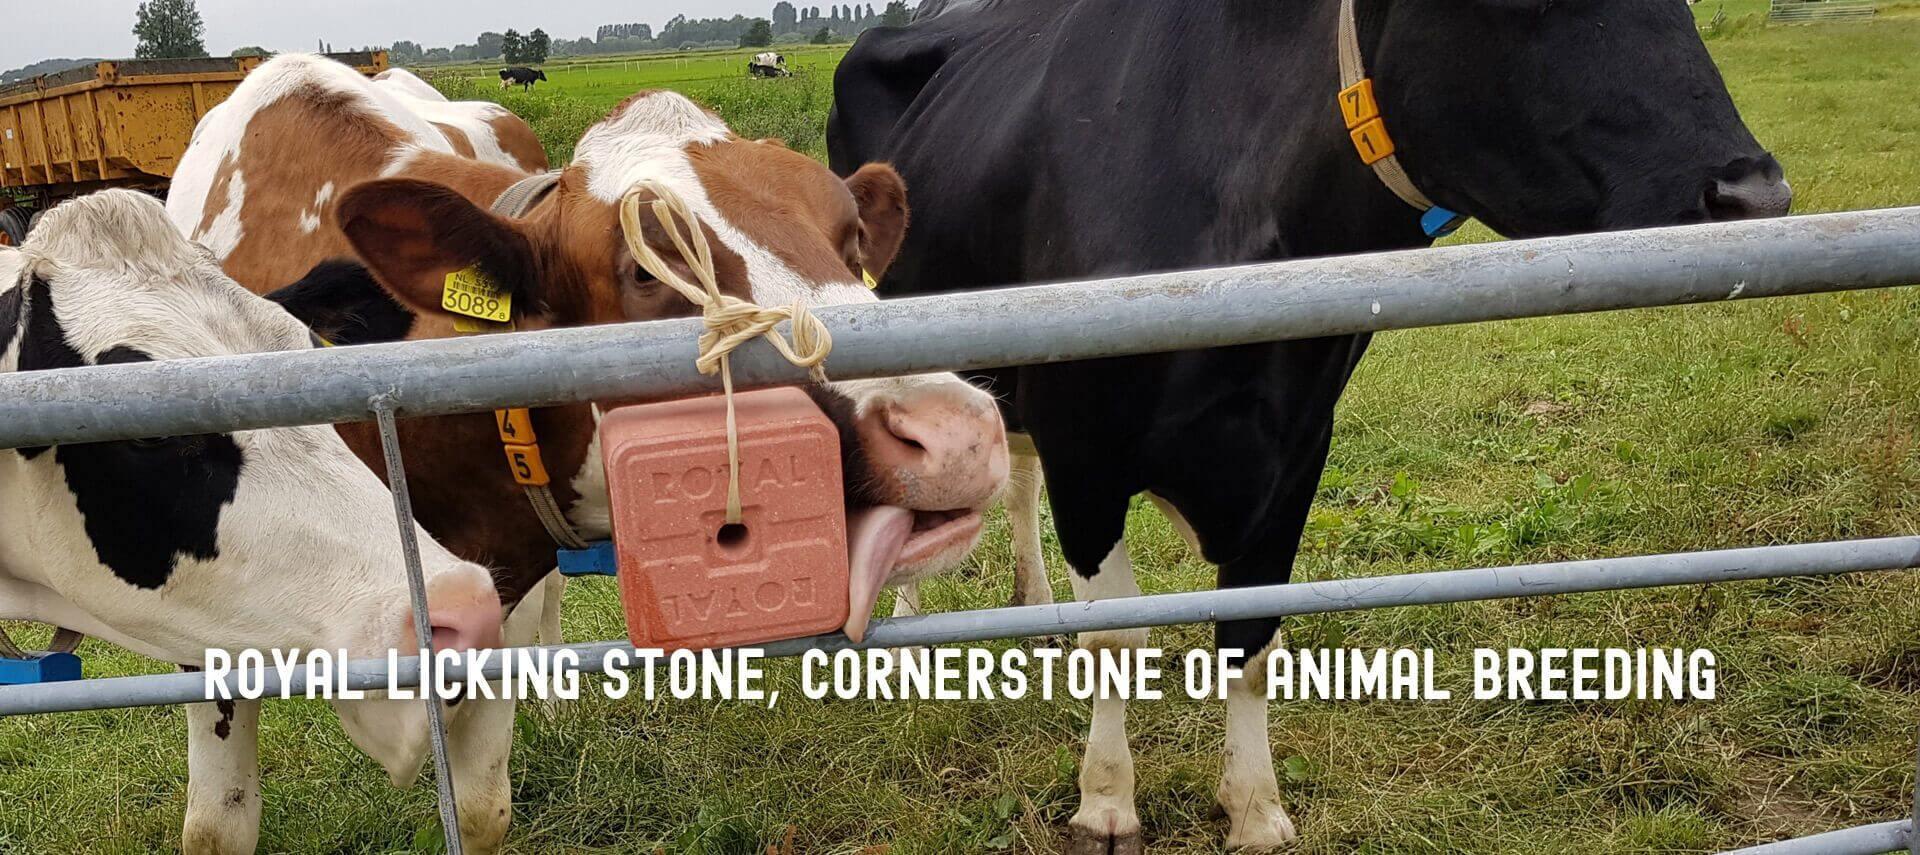 Royal licking stone, touchstone of animal husbandry